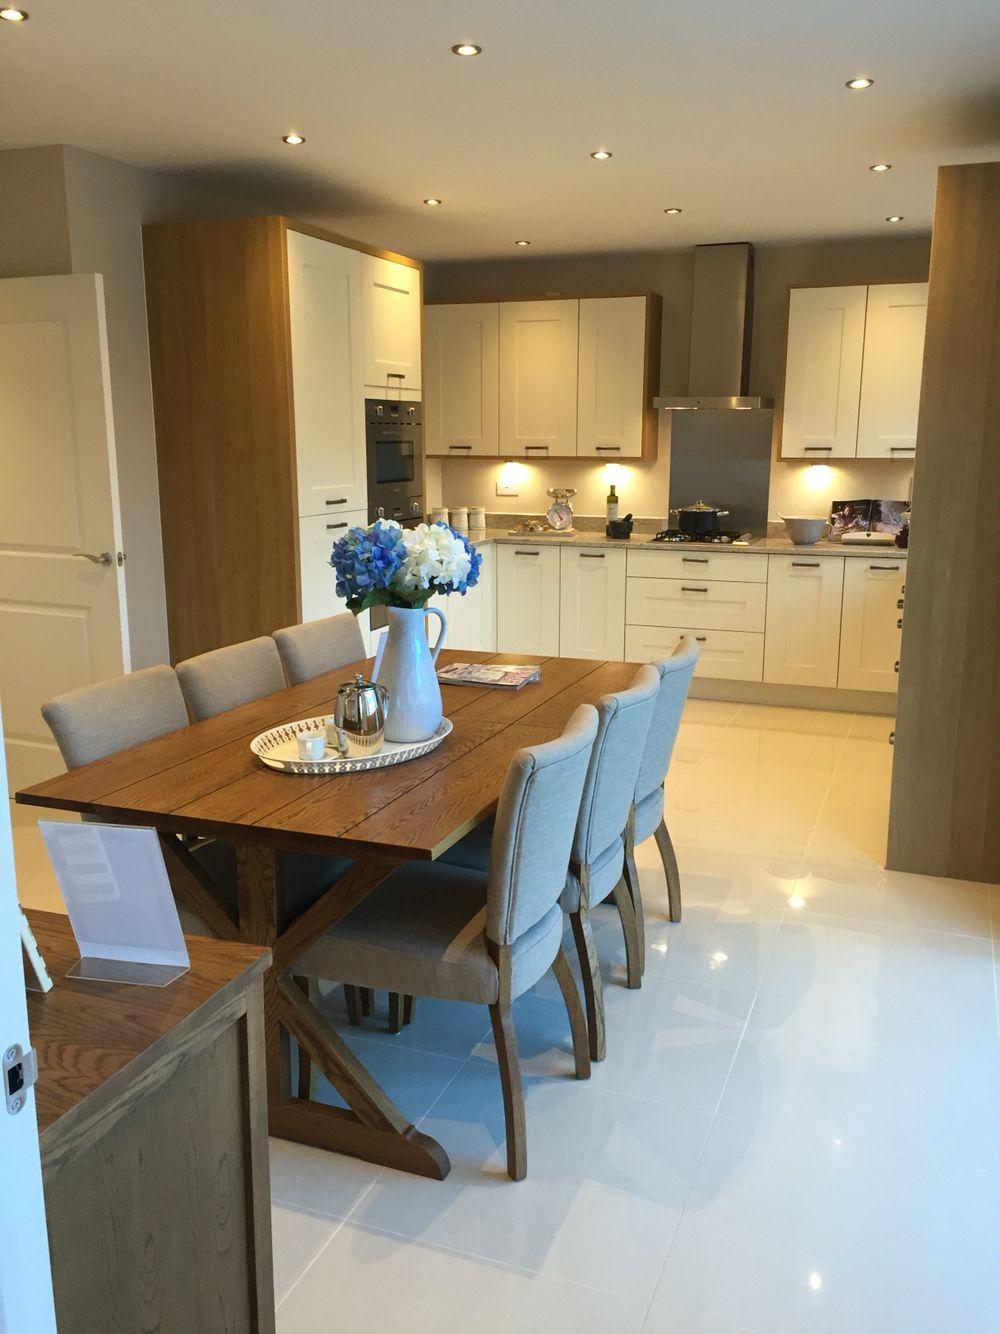 Amazing Redrow shaker kitchen | Homes | Pinterest | Shaker kitchen ...